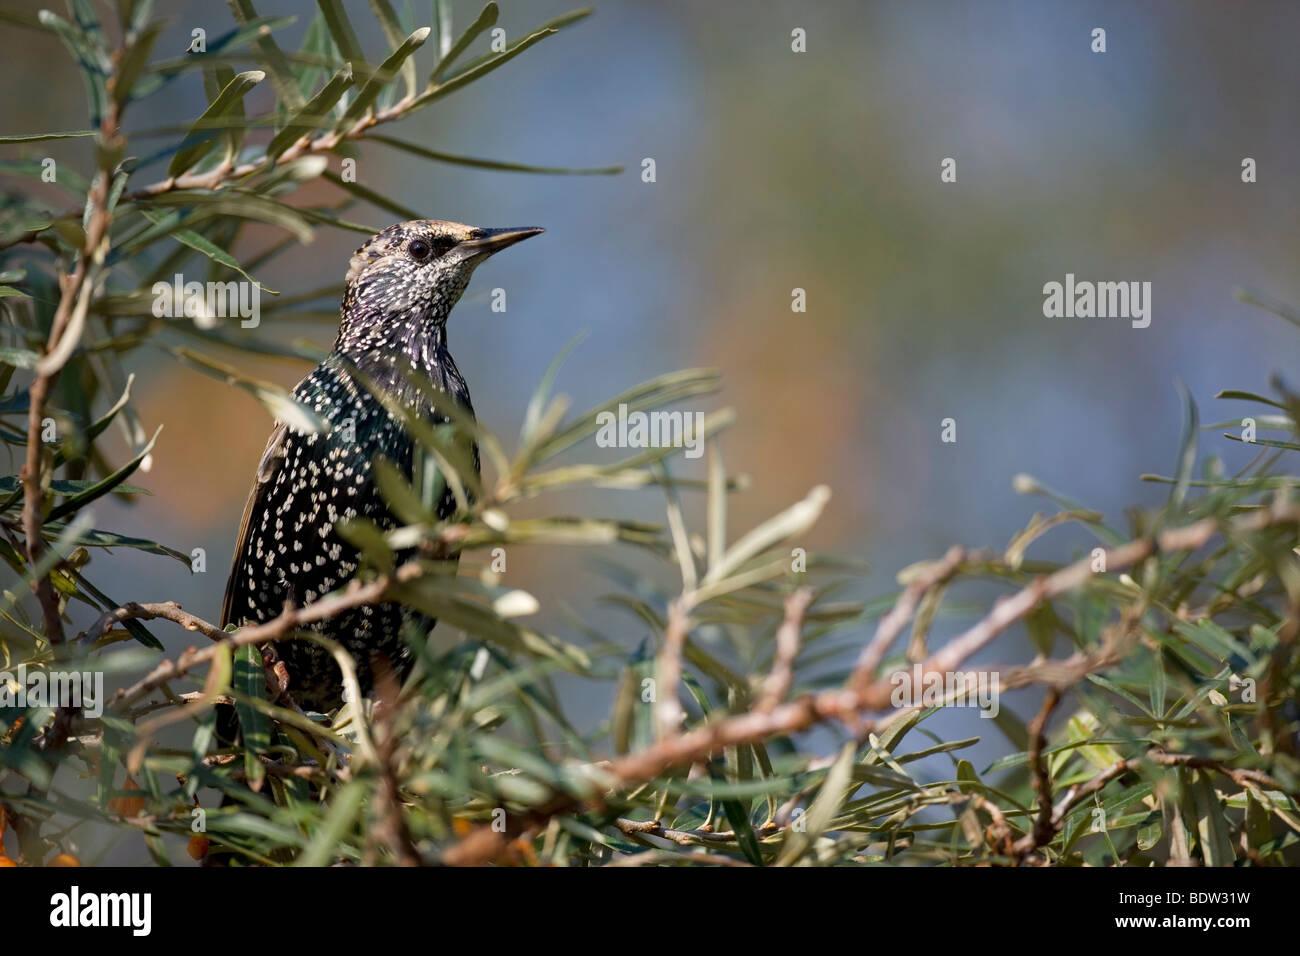 Starling & Sea Buckthorn / Sturnus vulgaris & Hippophae rhamnoides Stock Photo